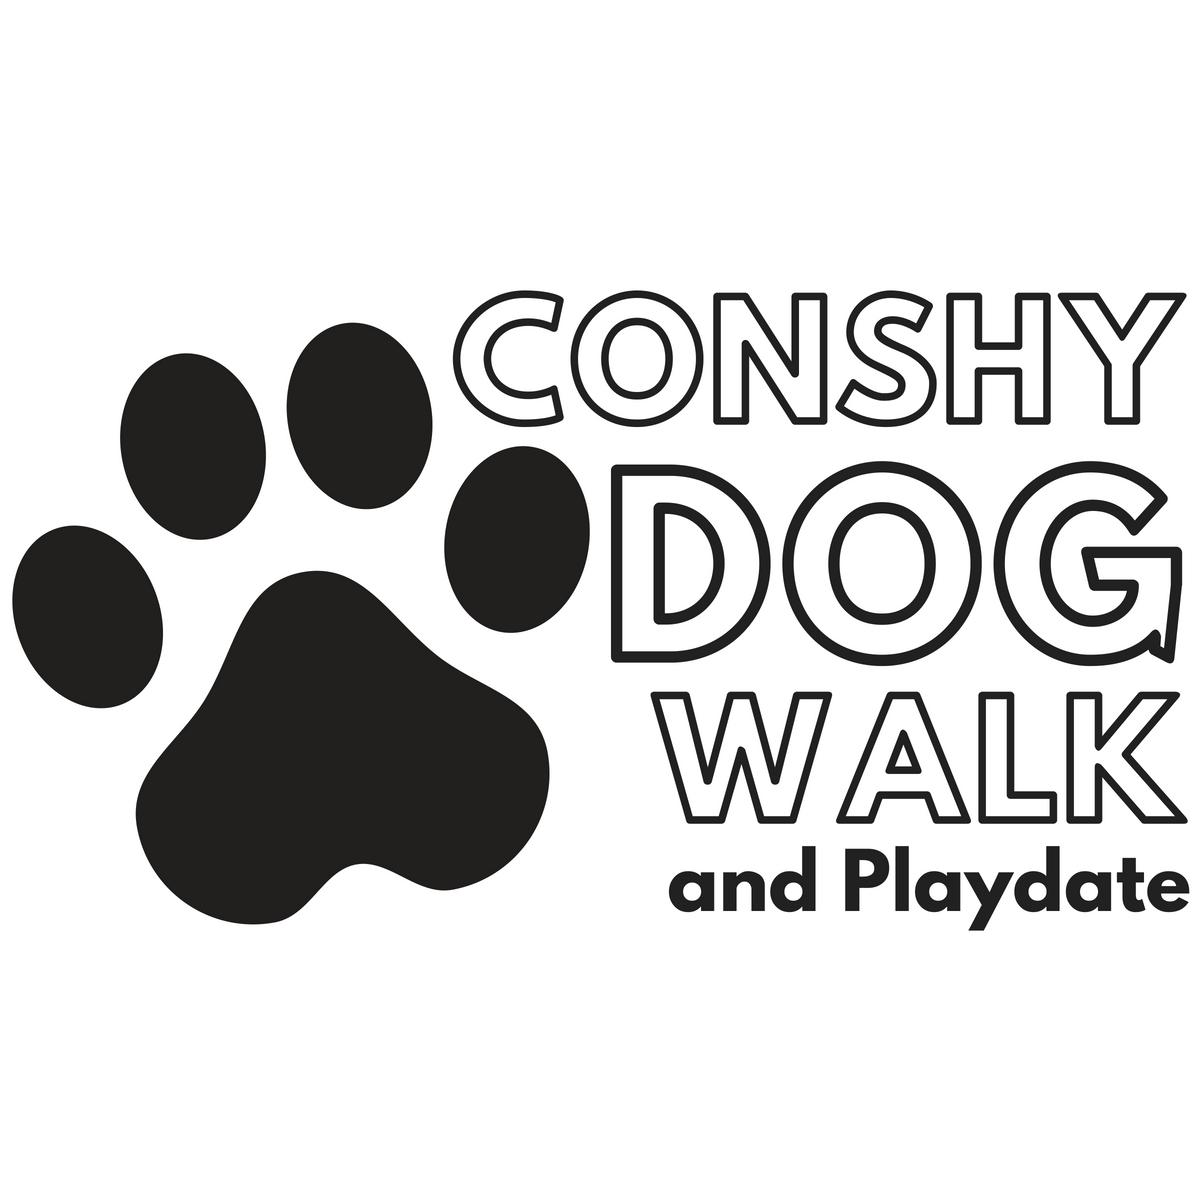 Conshy Dog Walk and Playdate presented by Pooch Patrol